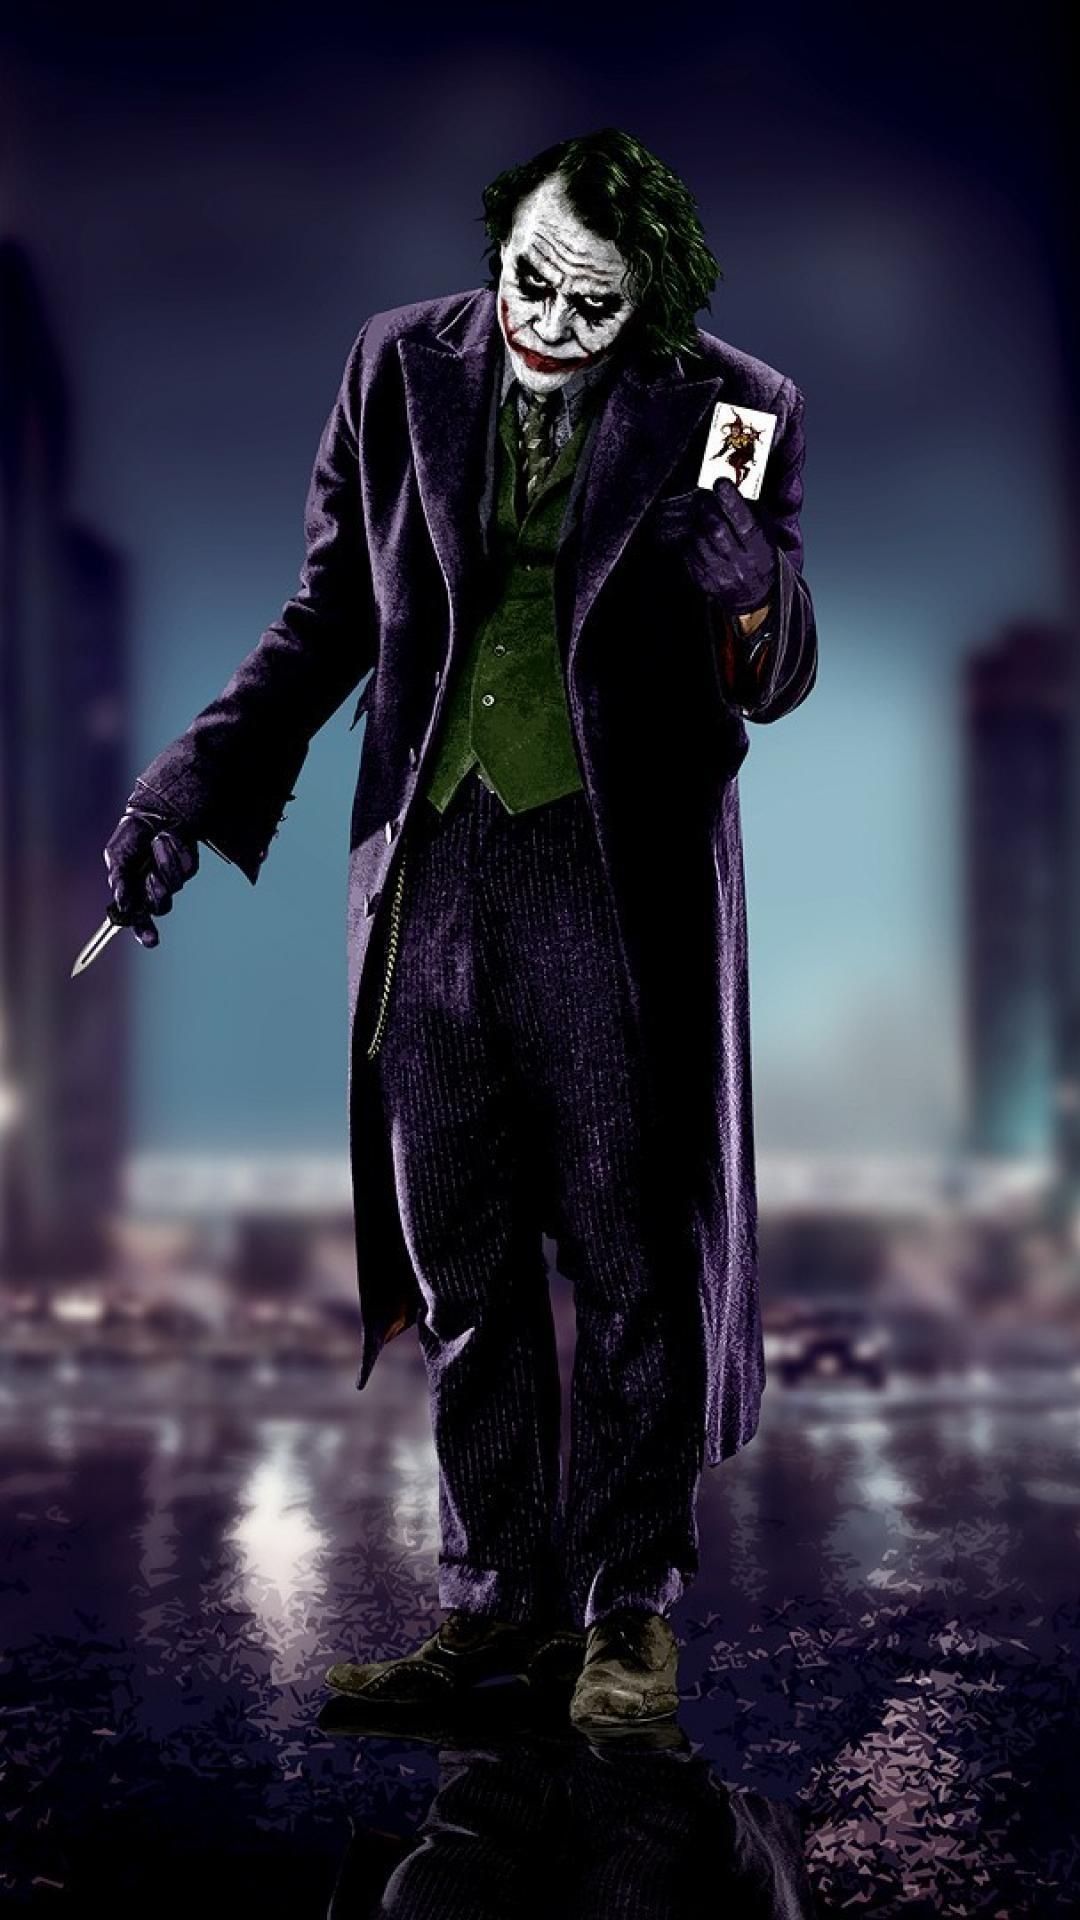 joker batman dark knight movies wallpapers rises movie iphone leto jared android mobile hd tilt shift 2008 ledger heath backgrounds